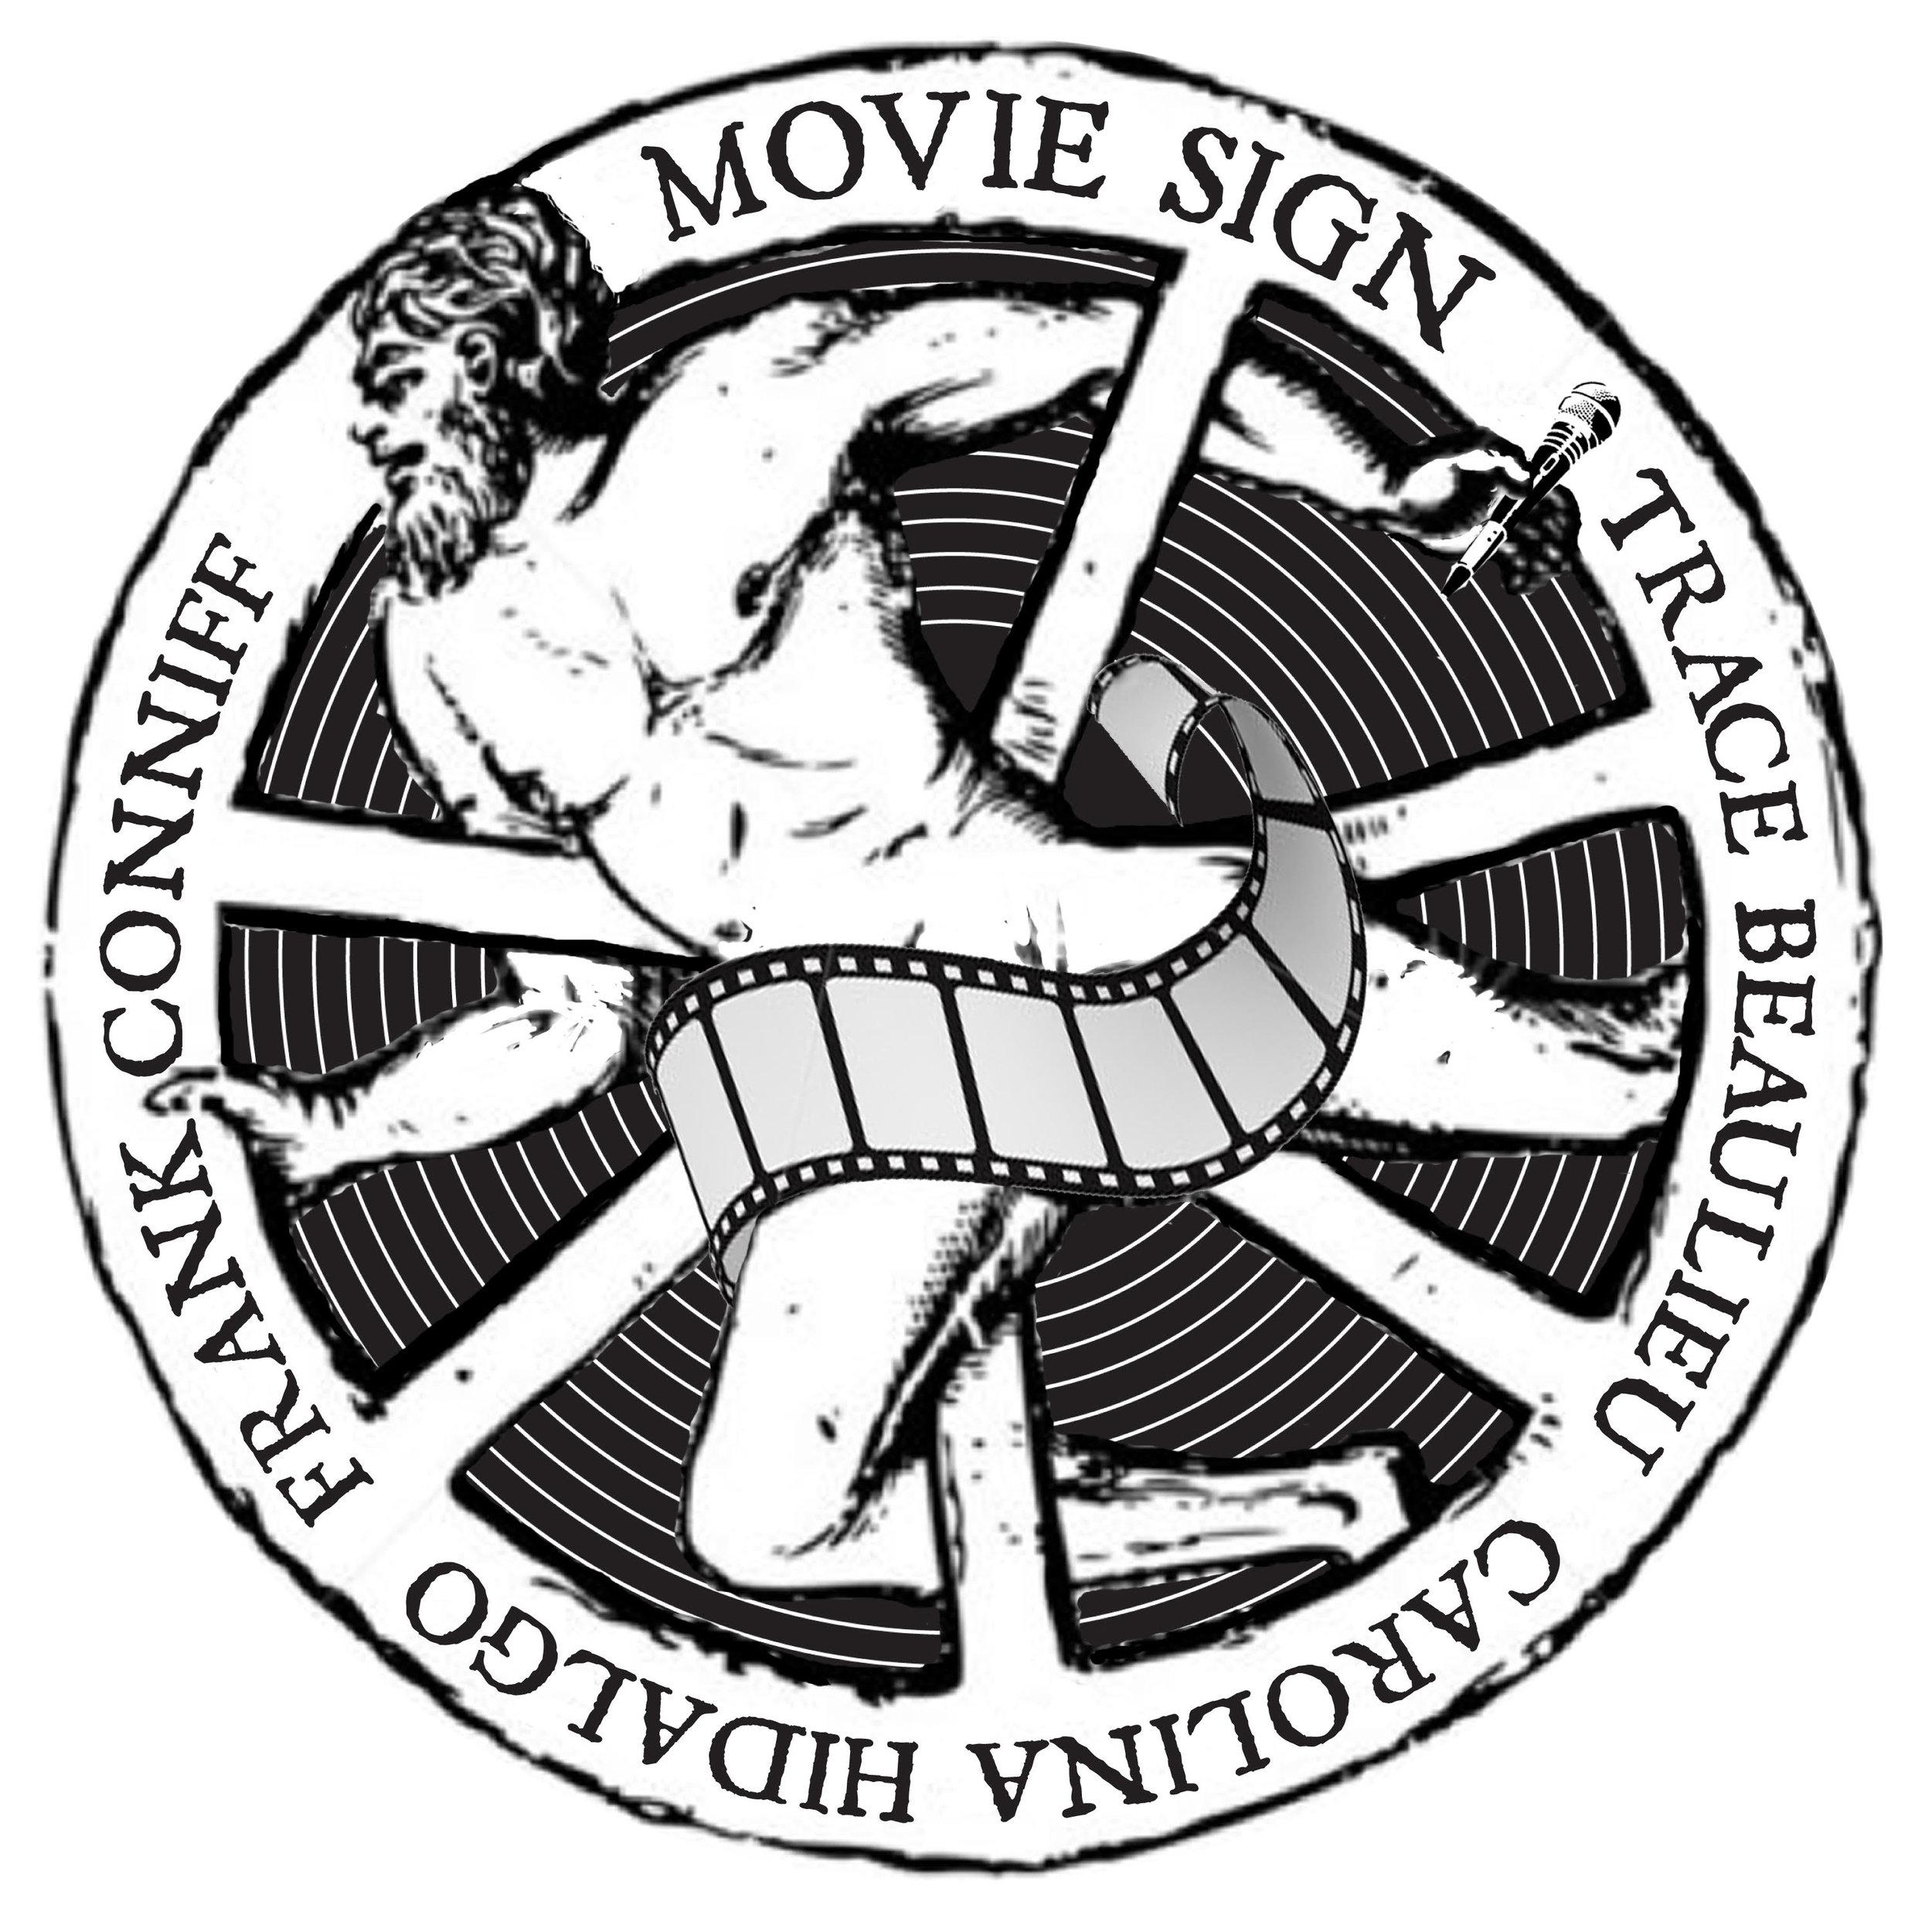 moviesign.jpg